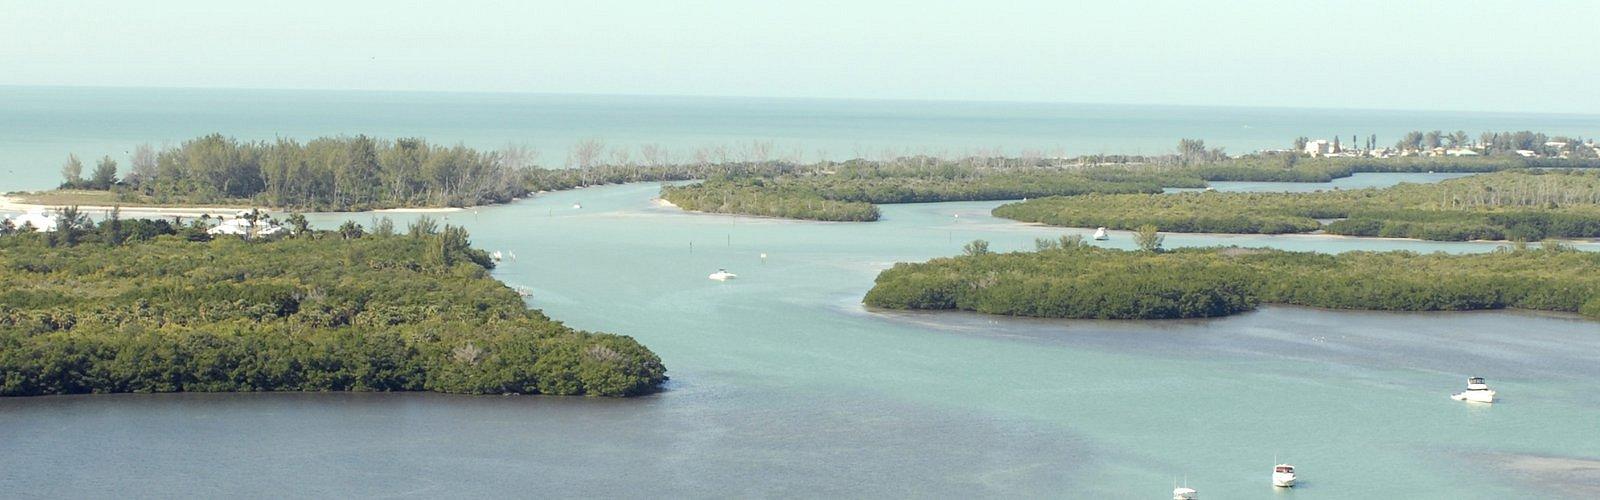 CharlotteHarborTravel.com - Englewood-Cape Haze, Florida